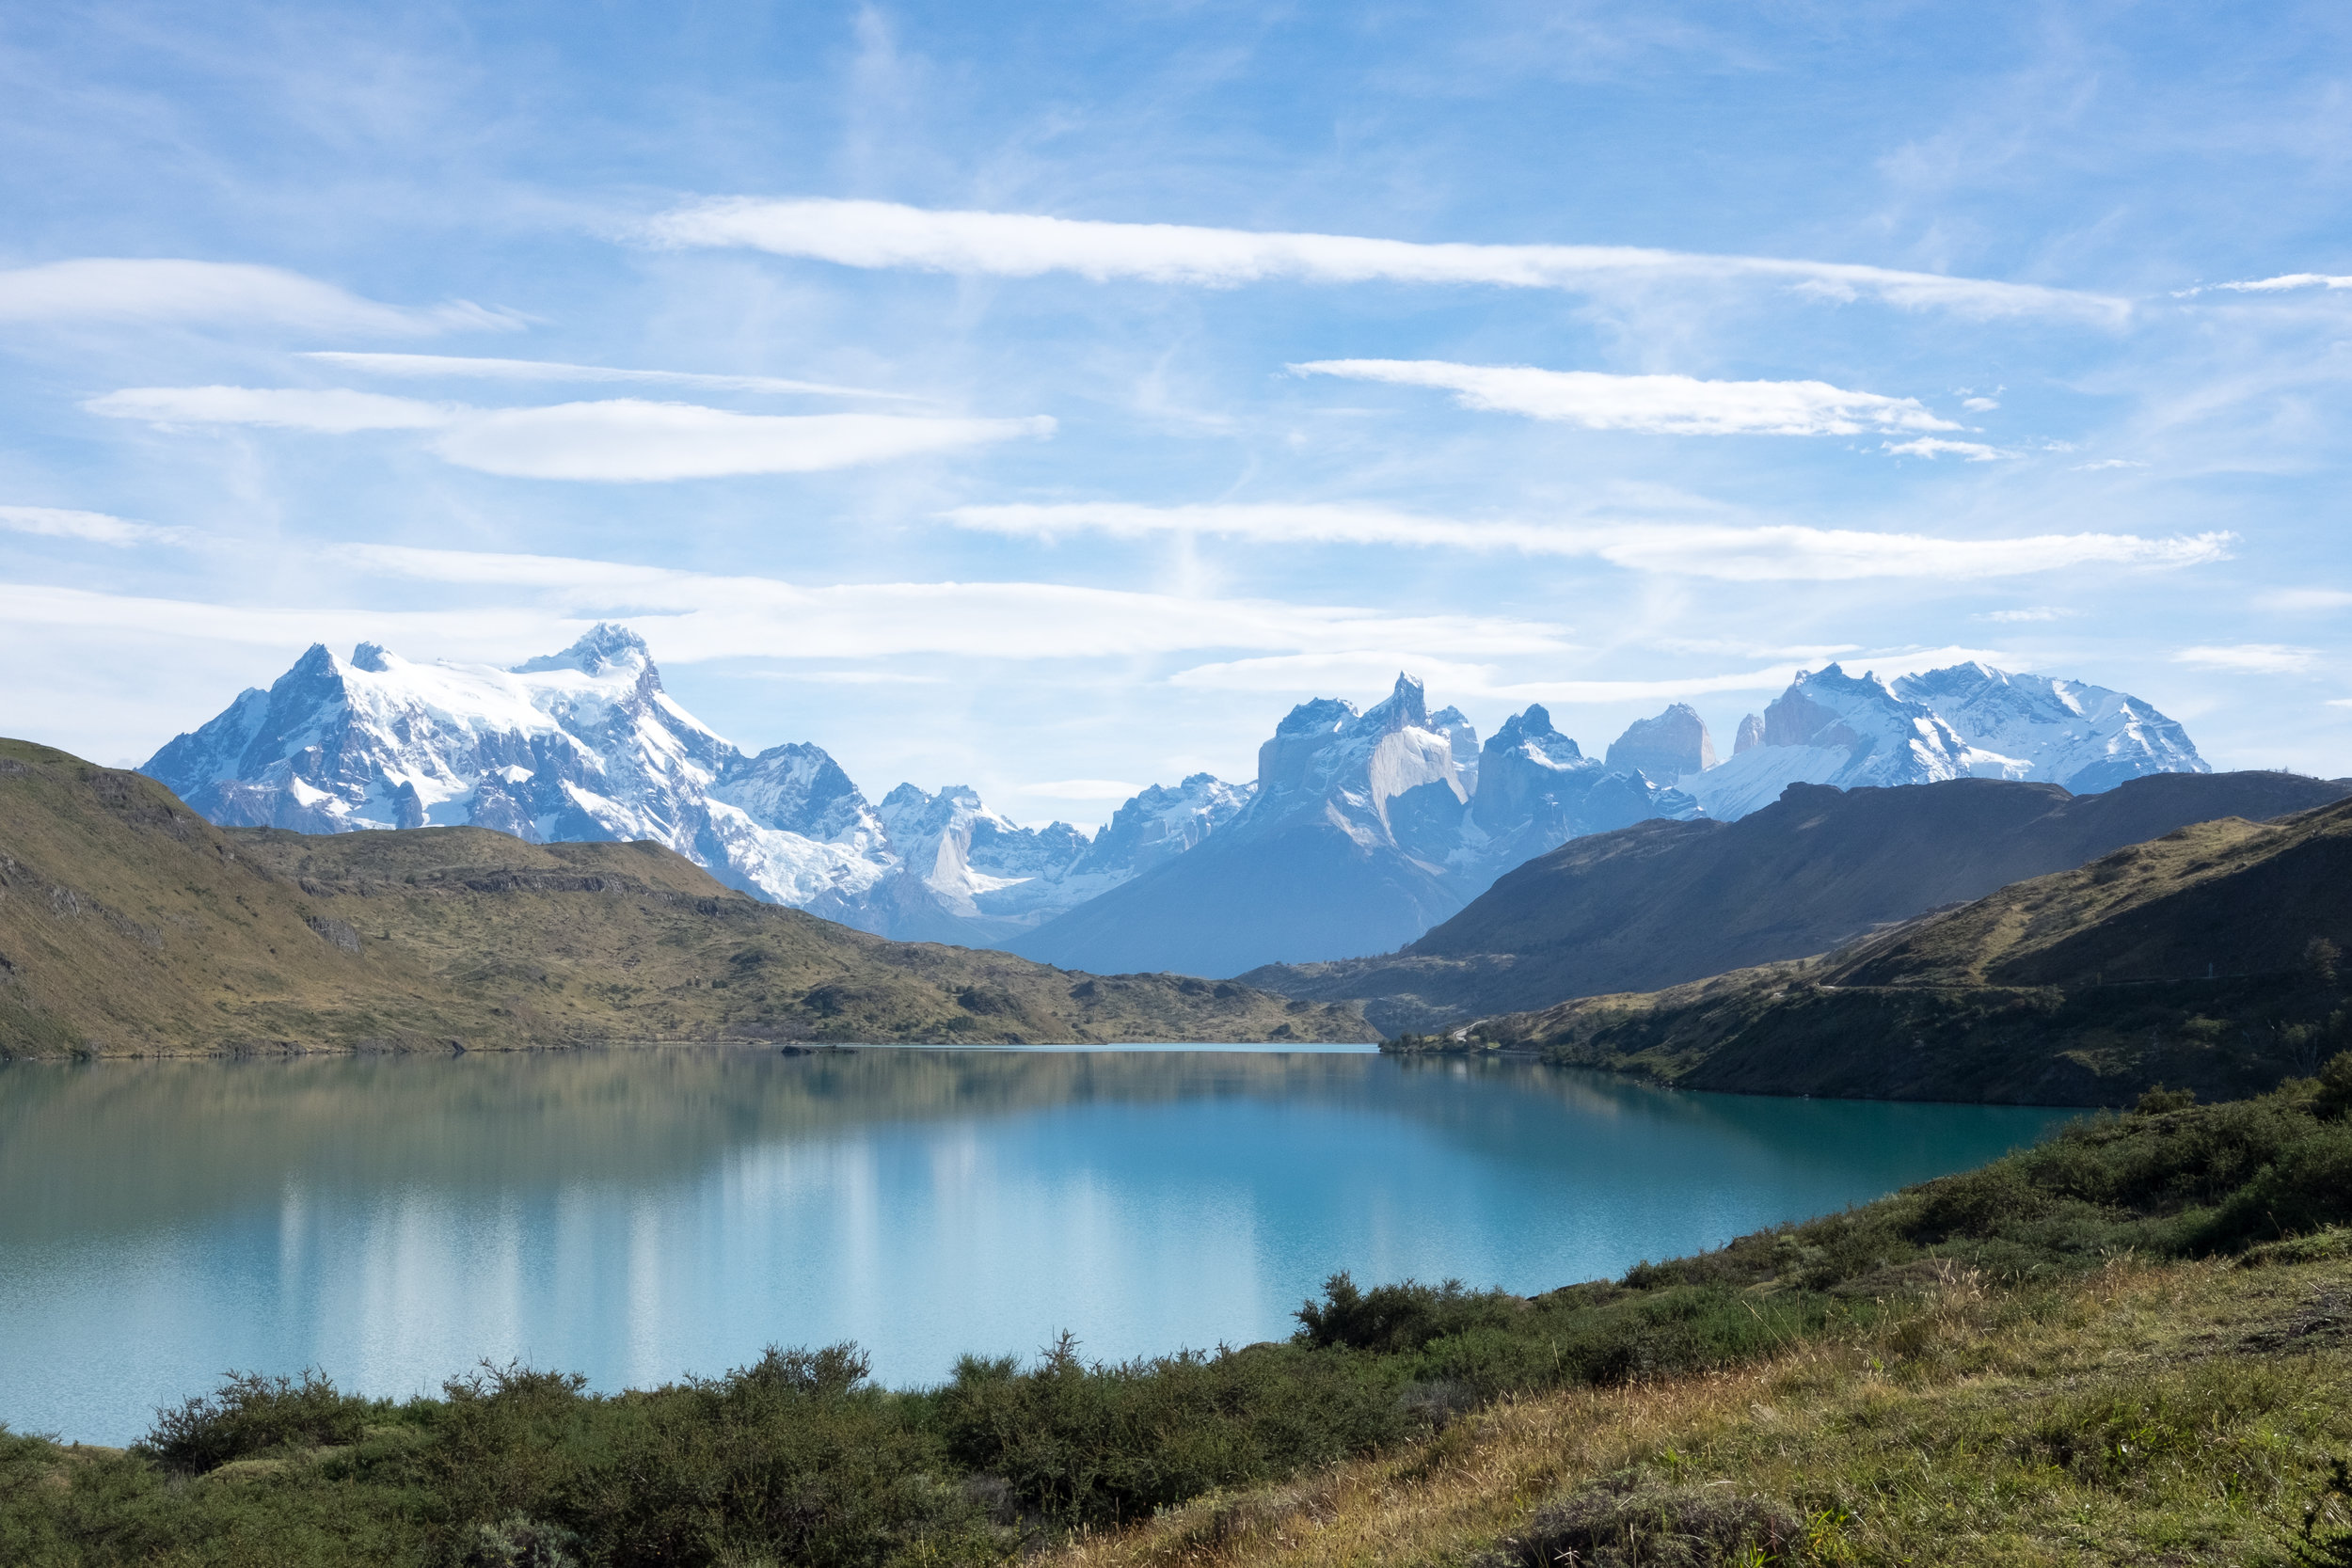 The Torres del Paine peaks